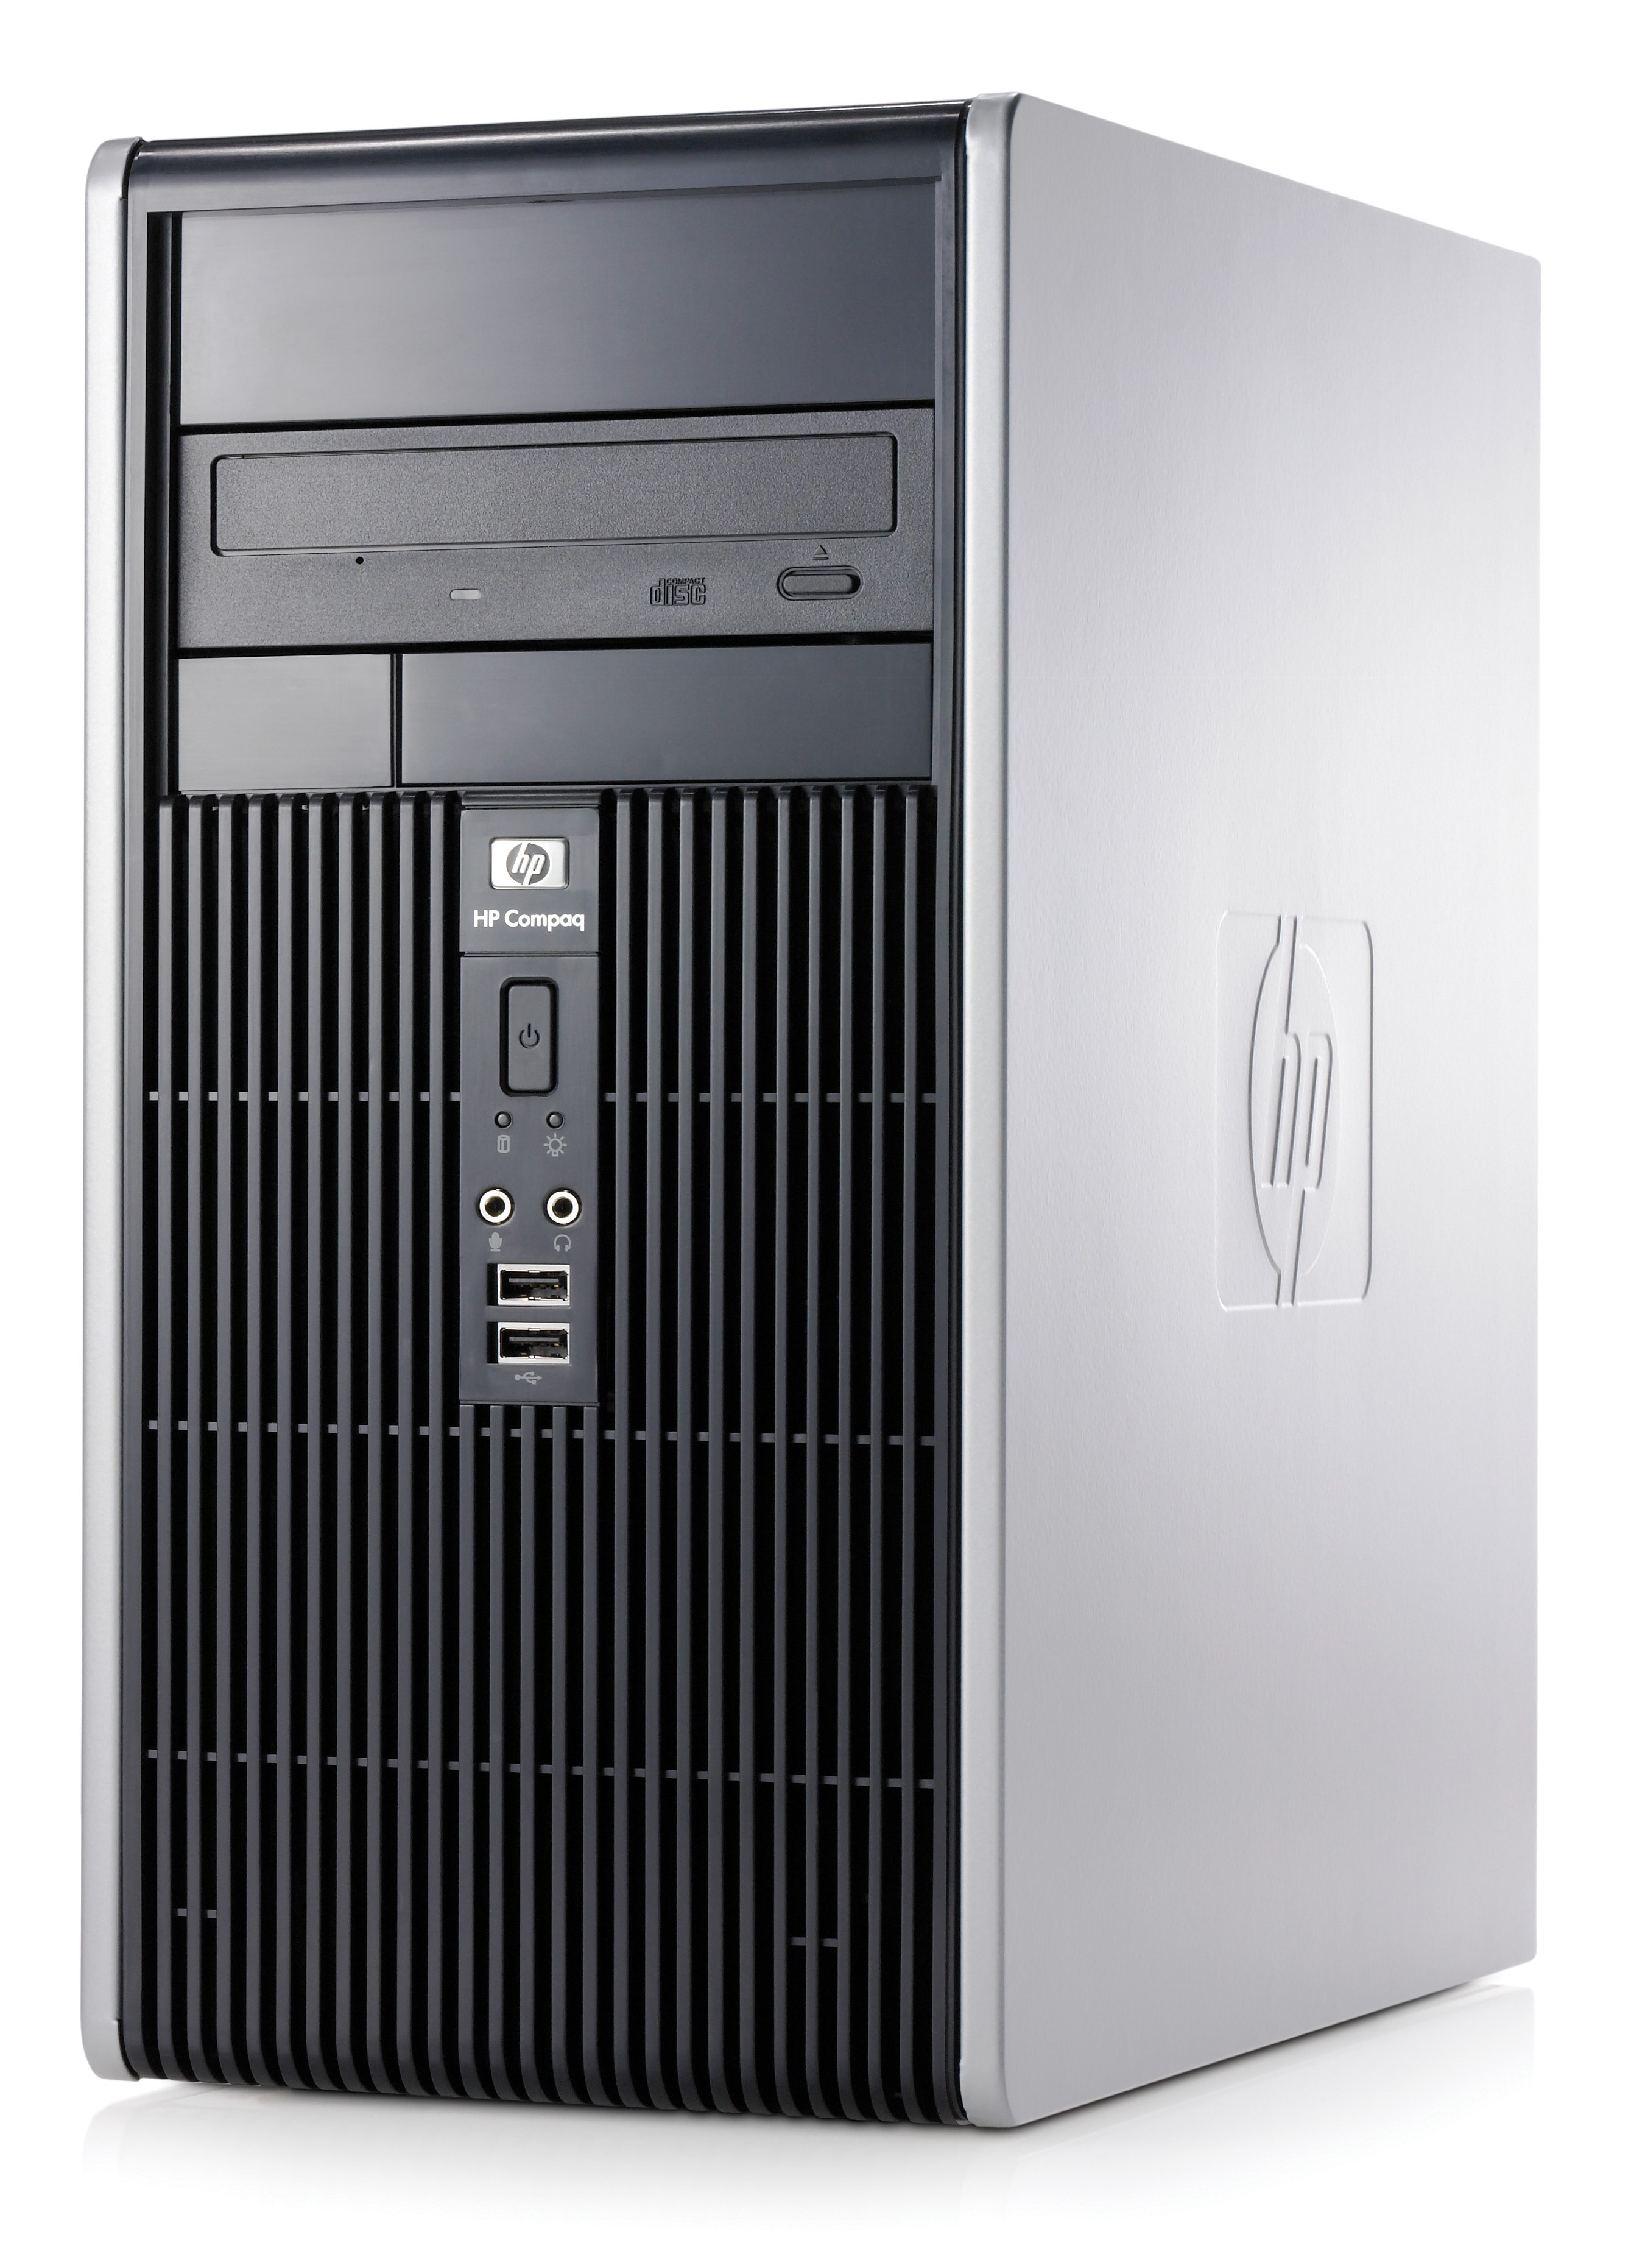 HP Compaq dc5850 MT